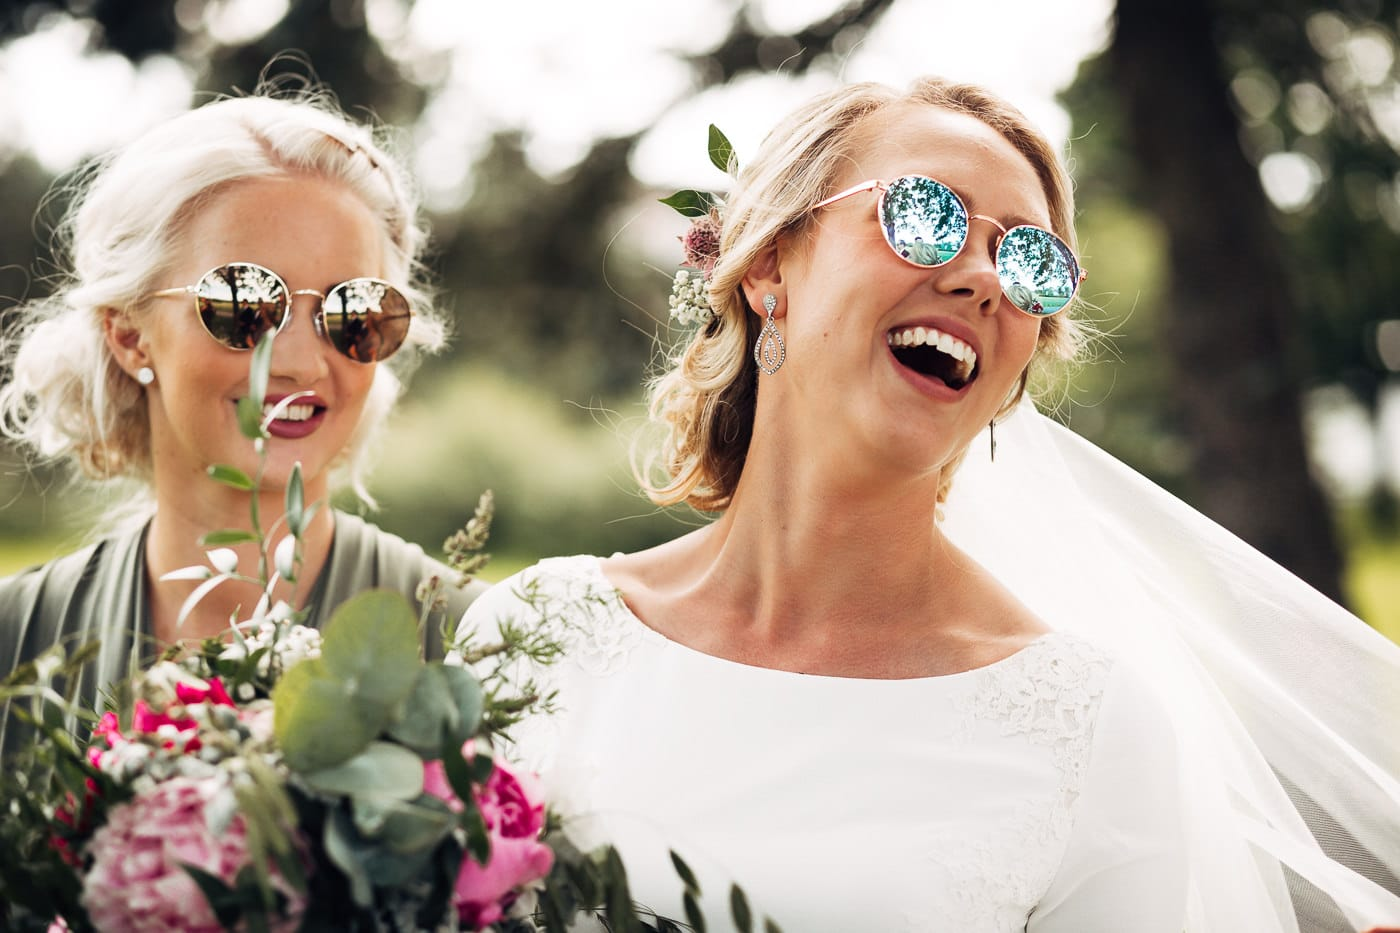 Karoline & Andreas - bryllup i Østfold med magiske detaljer Bryllup Fredrikstad Fotograf 43